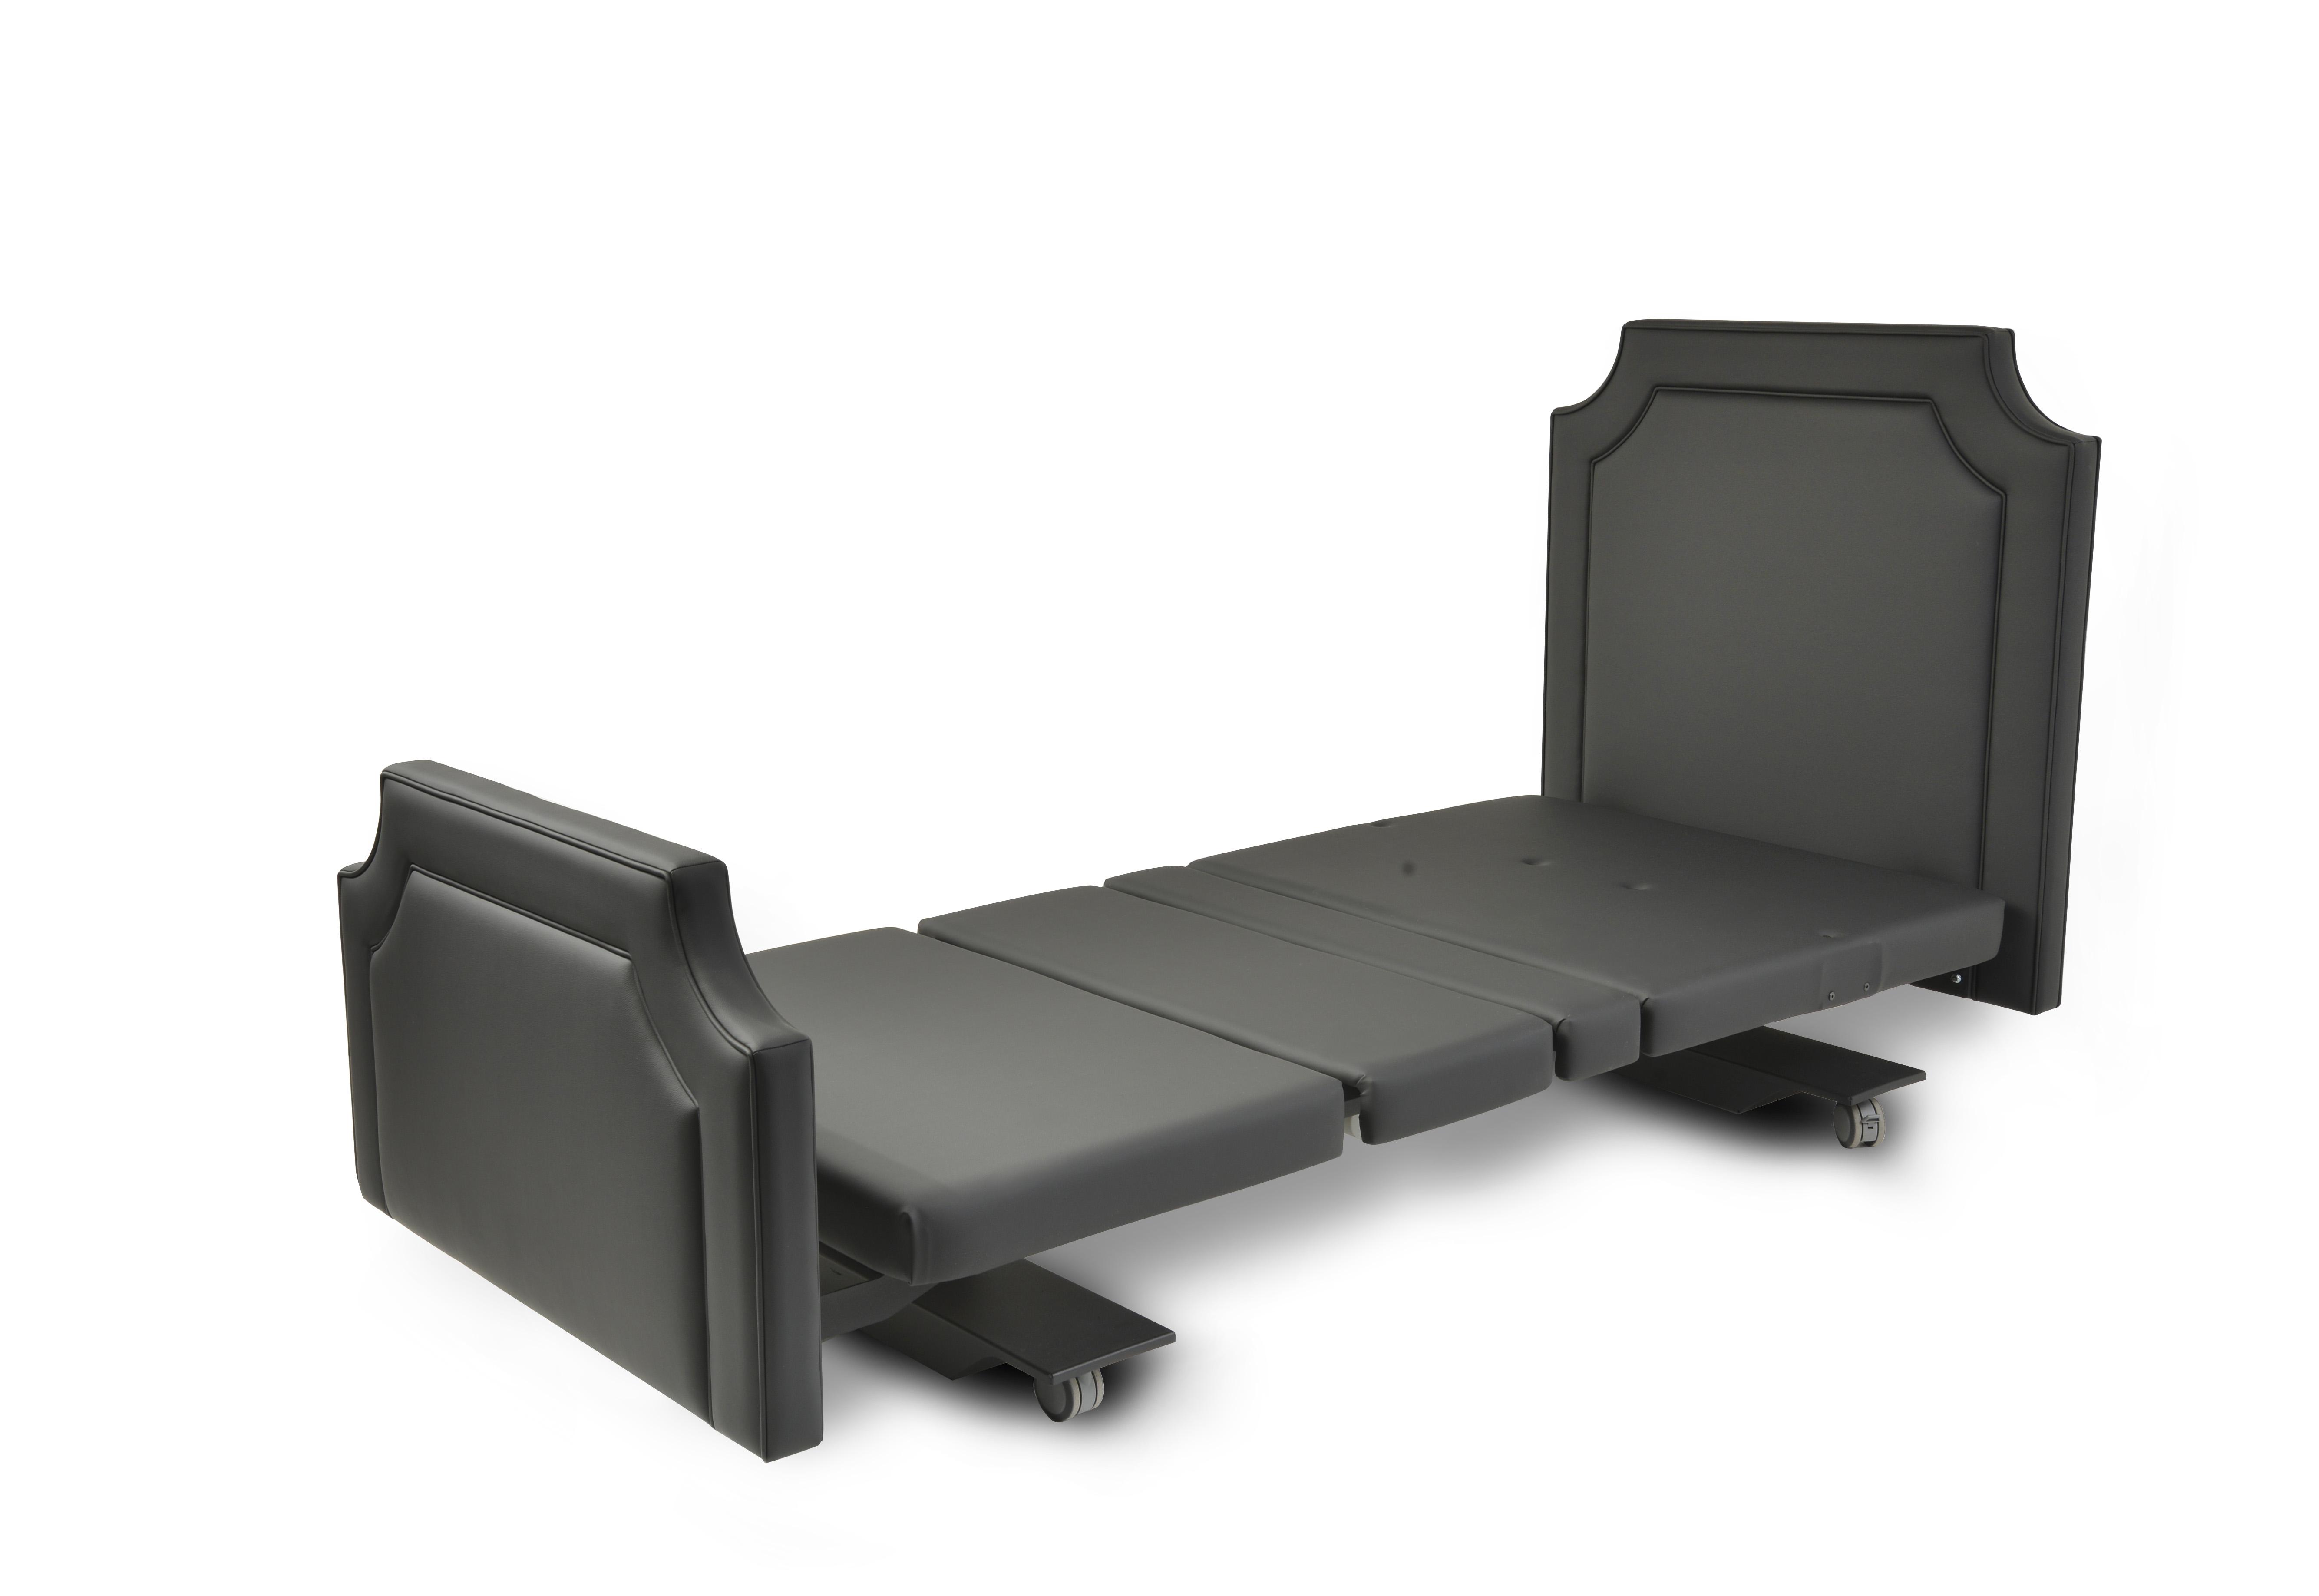 Assured Comfort Hi Low Adjustable Bed - Mobile Series - Fabric - Down Position